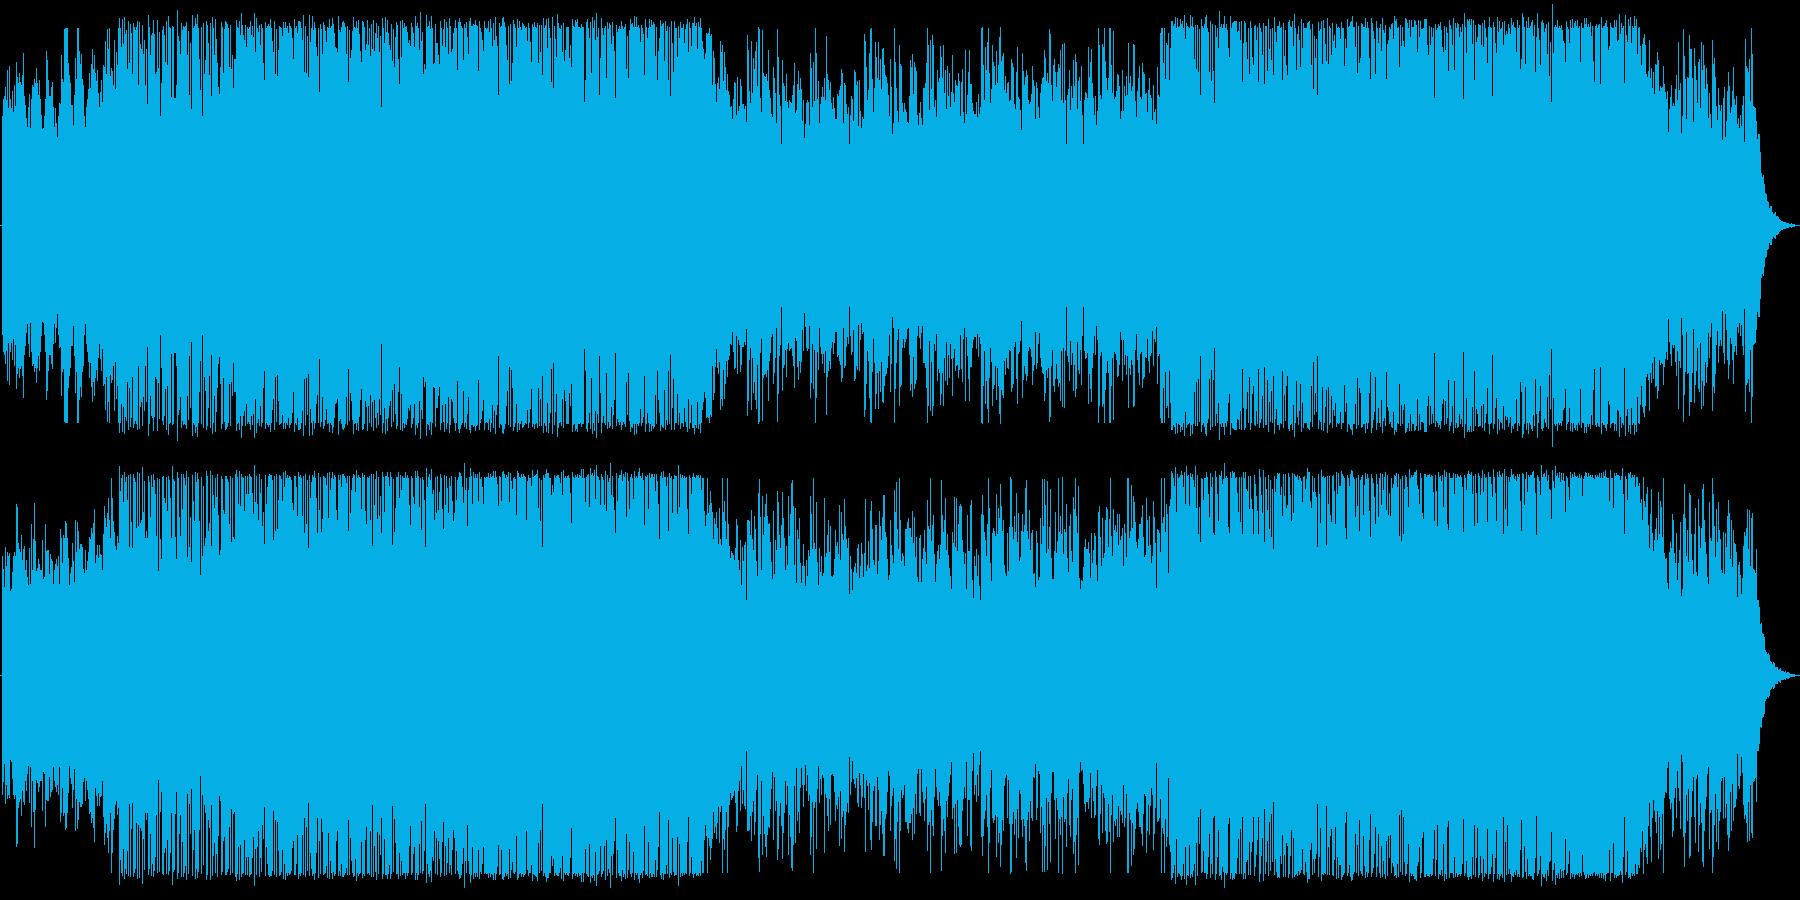 Overseas car brand CM image BGM / Western music's reproduced waveform